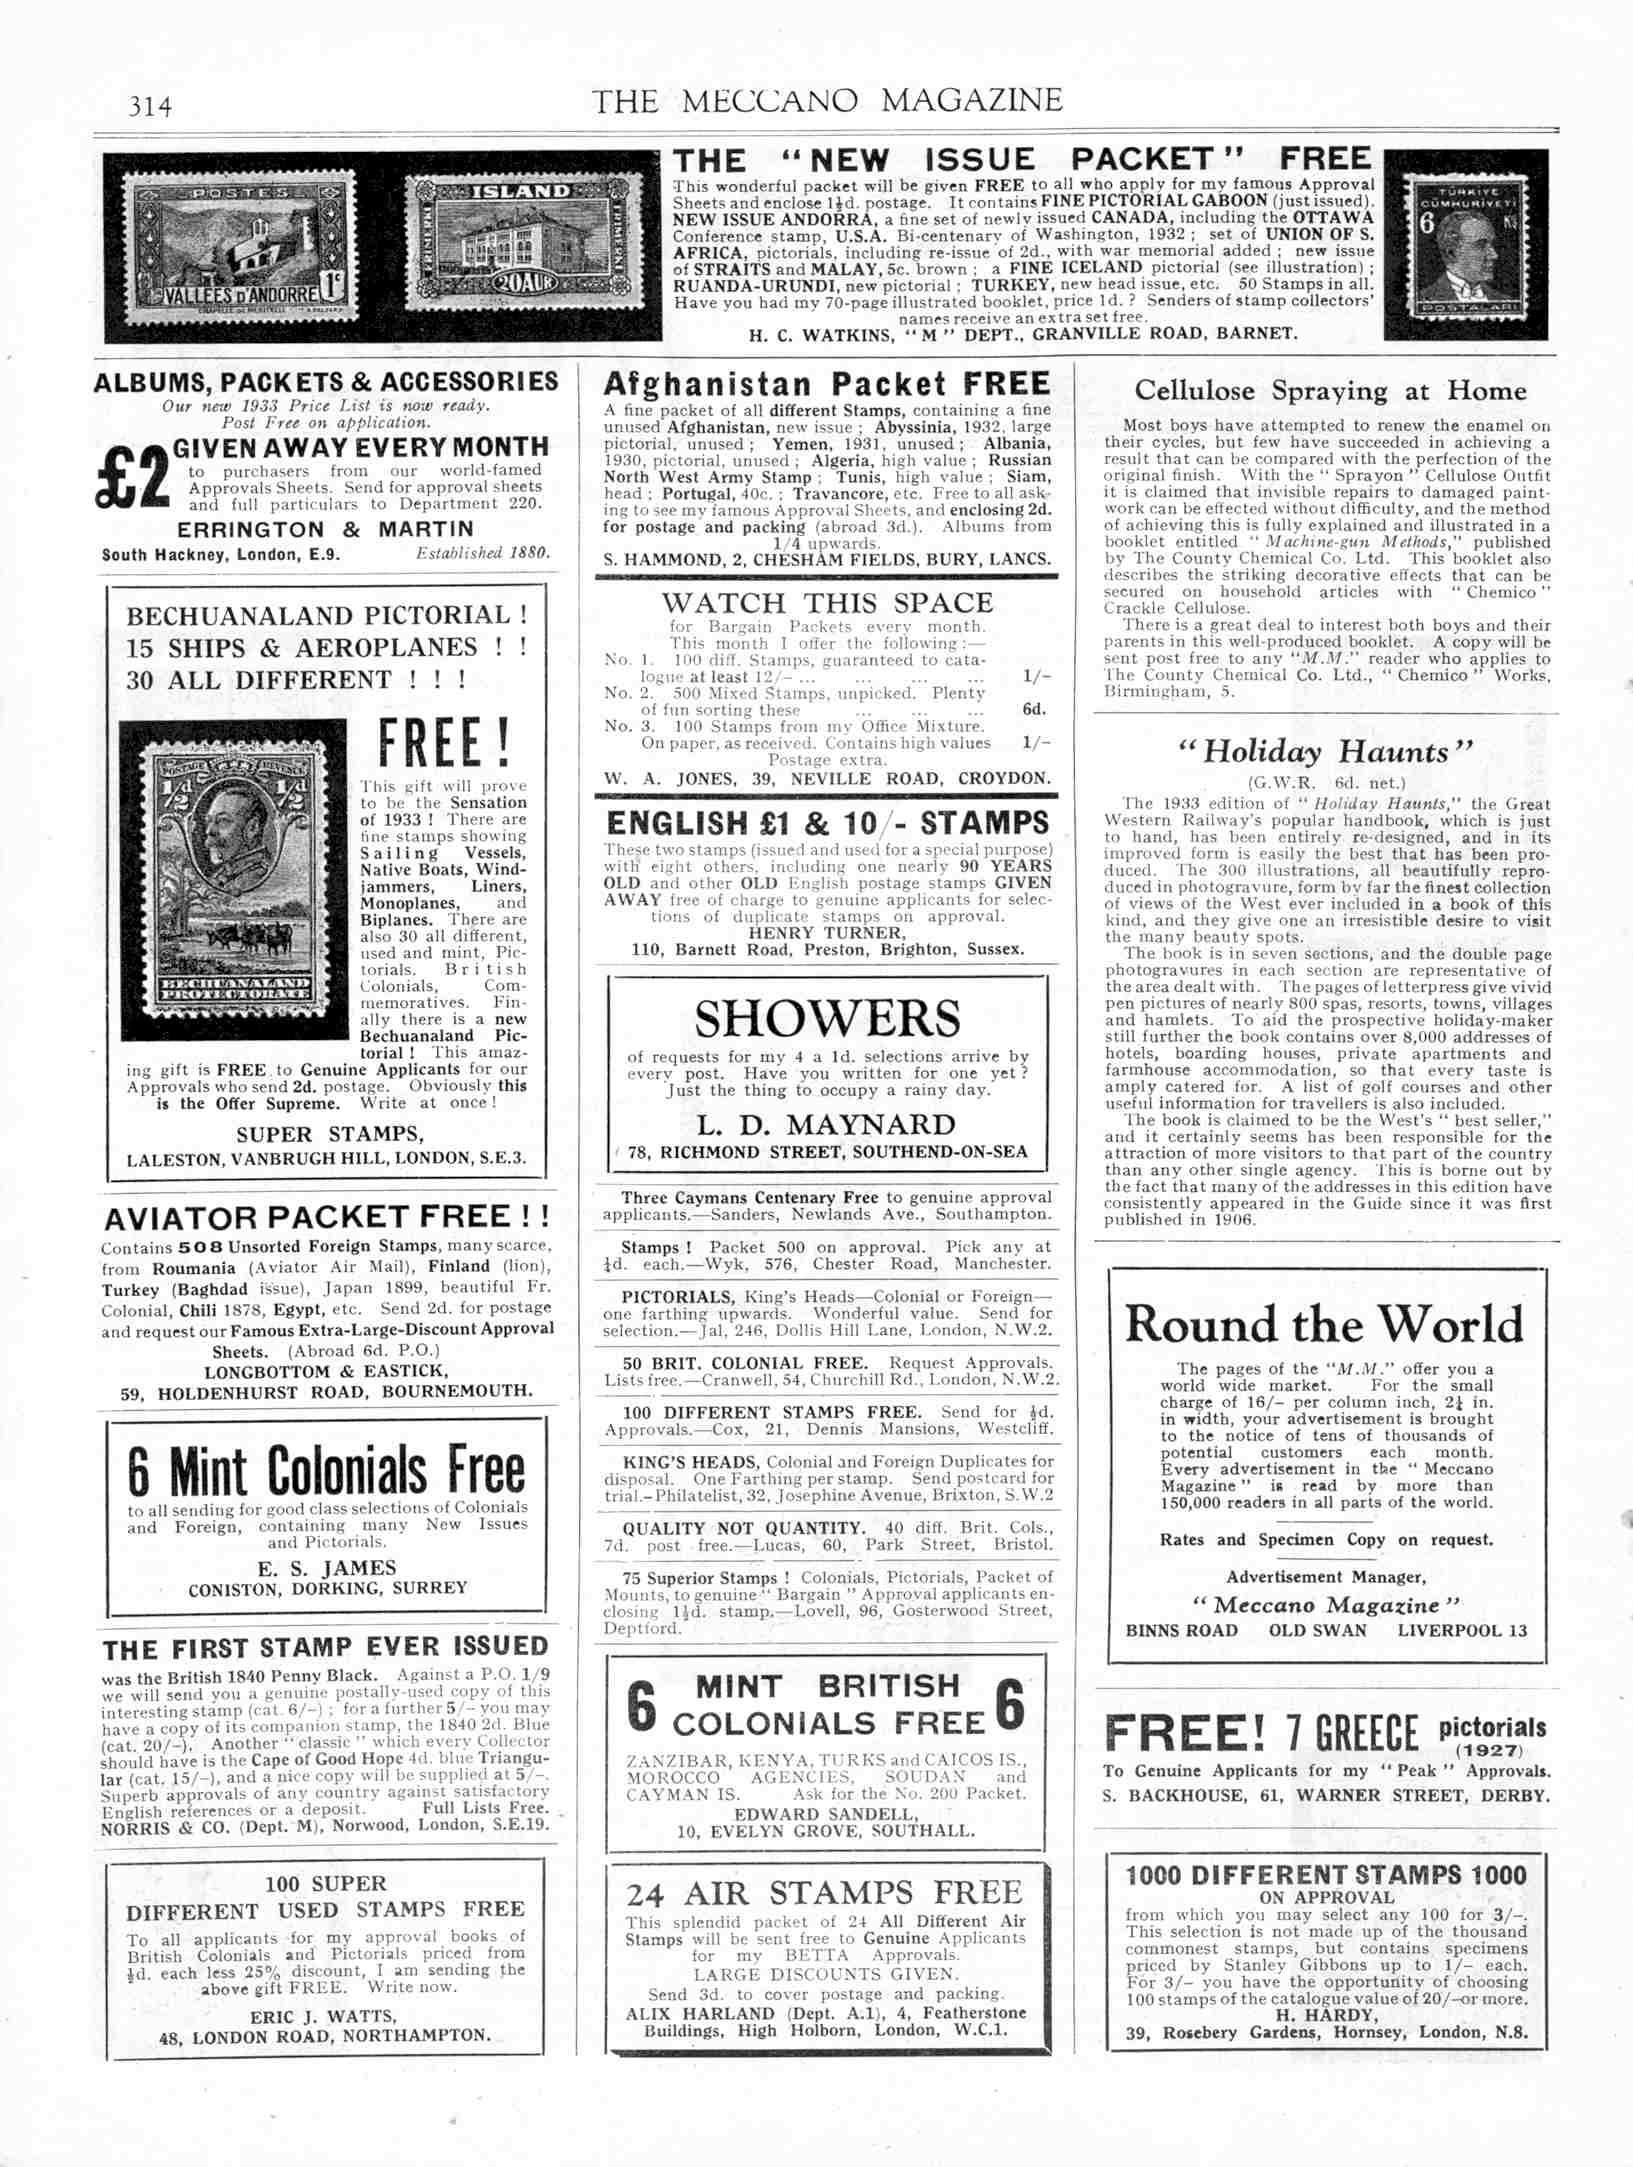 UK Meccano Magazine April 1933 Page 314